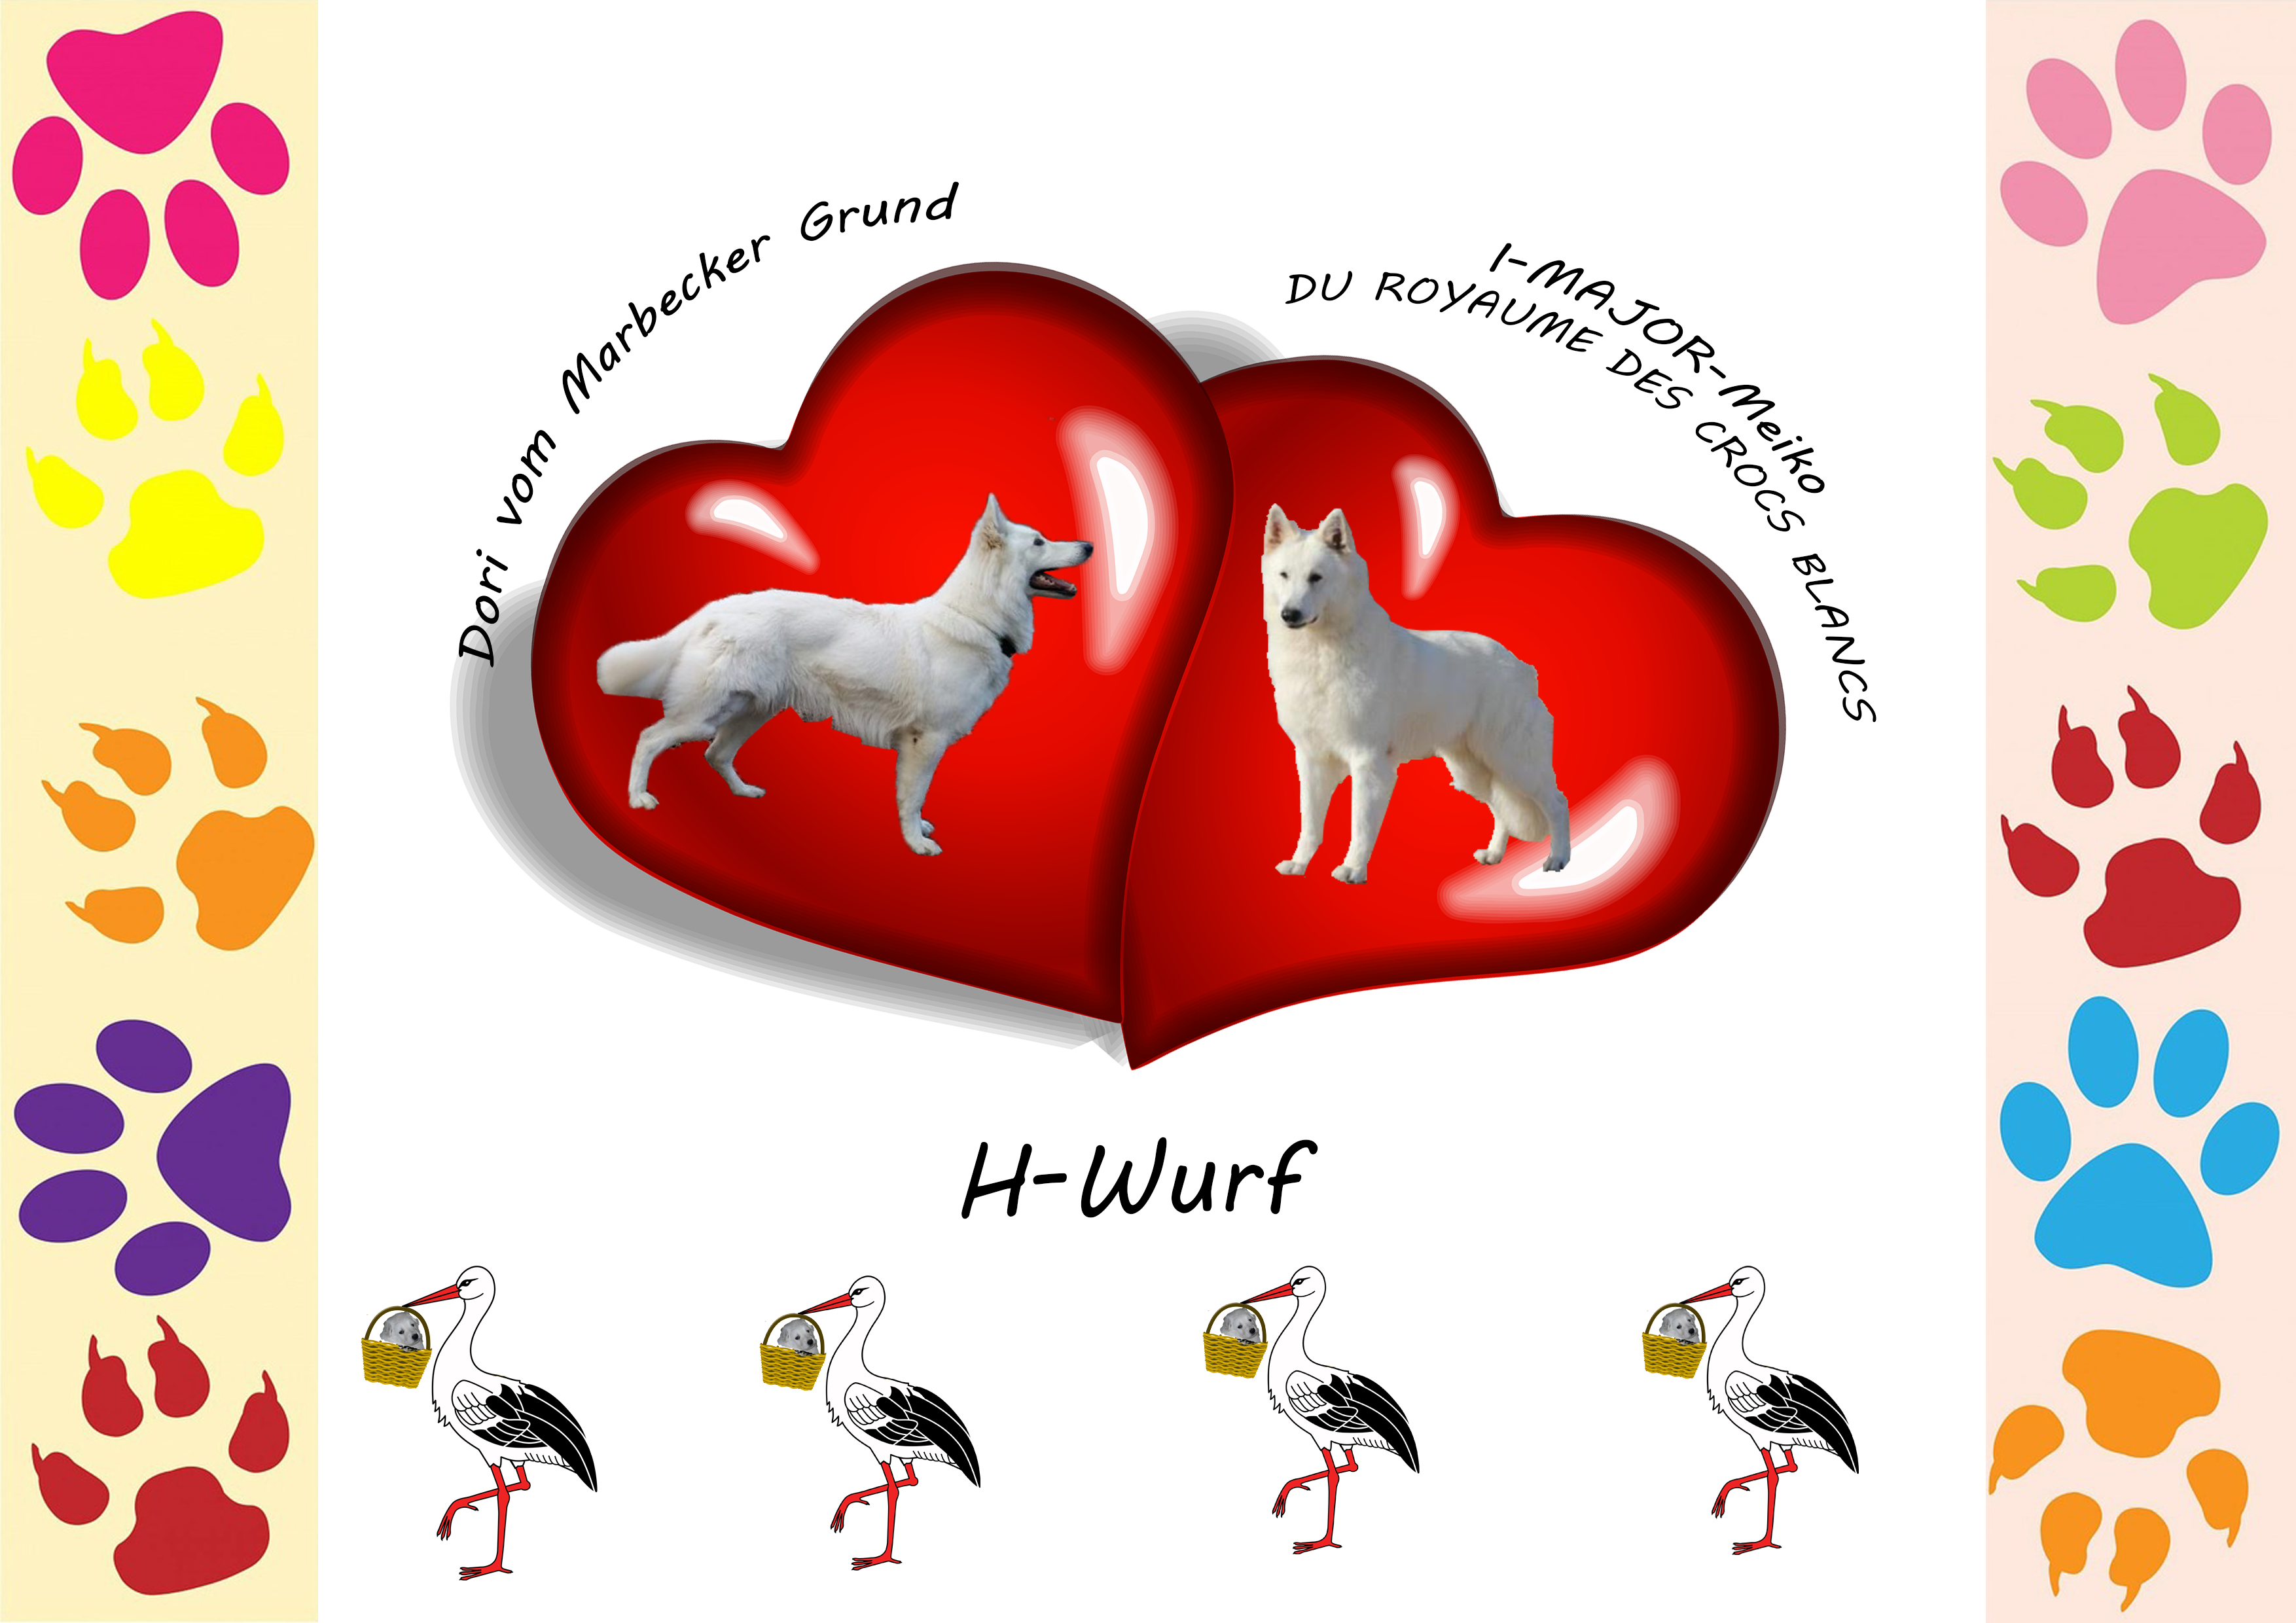 HWurf